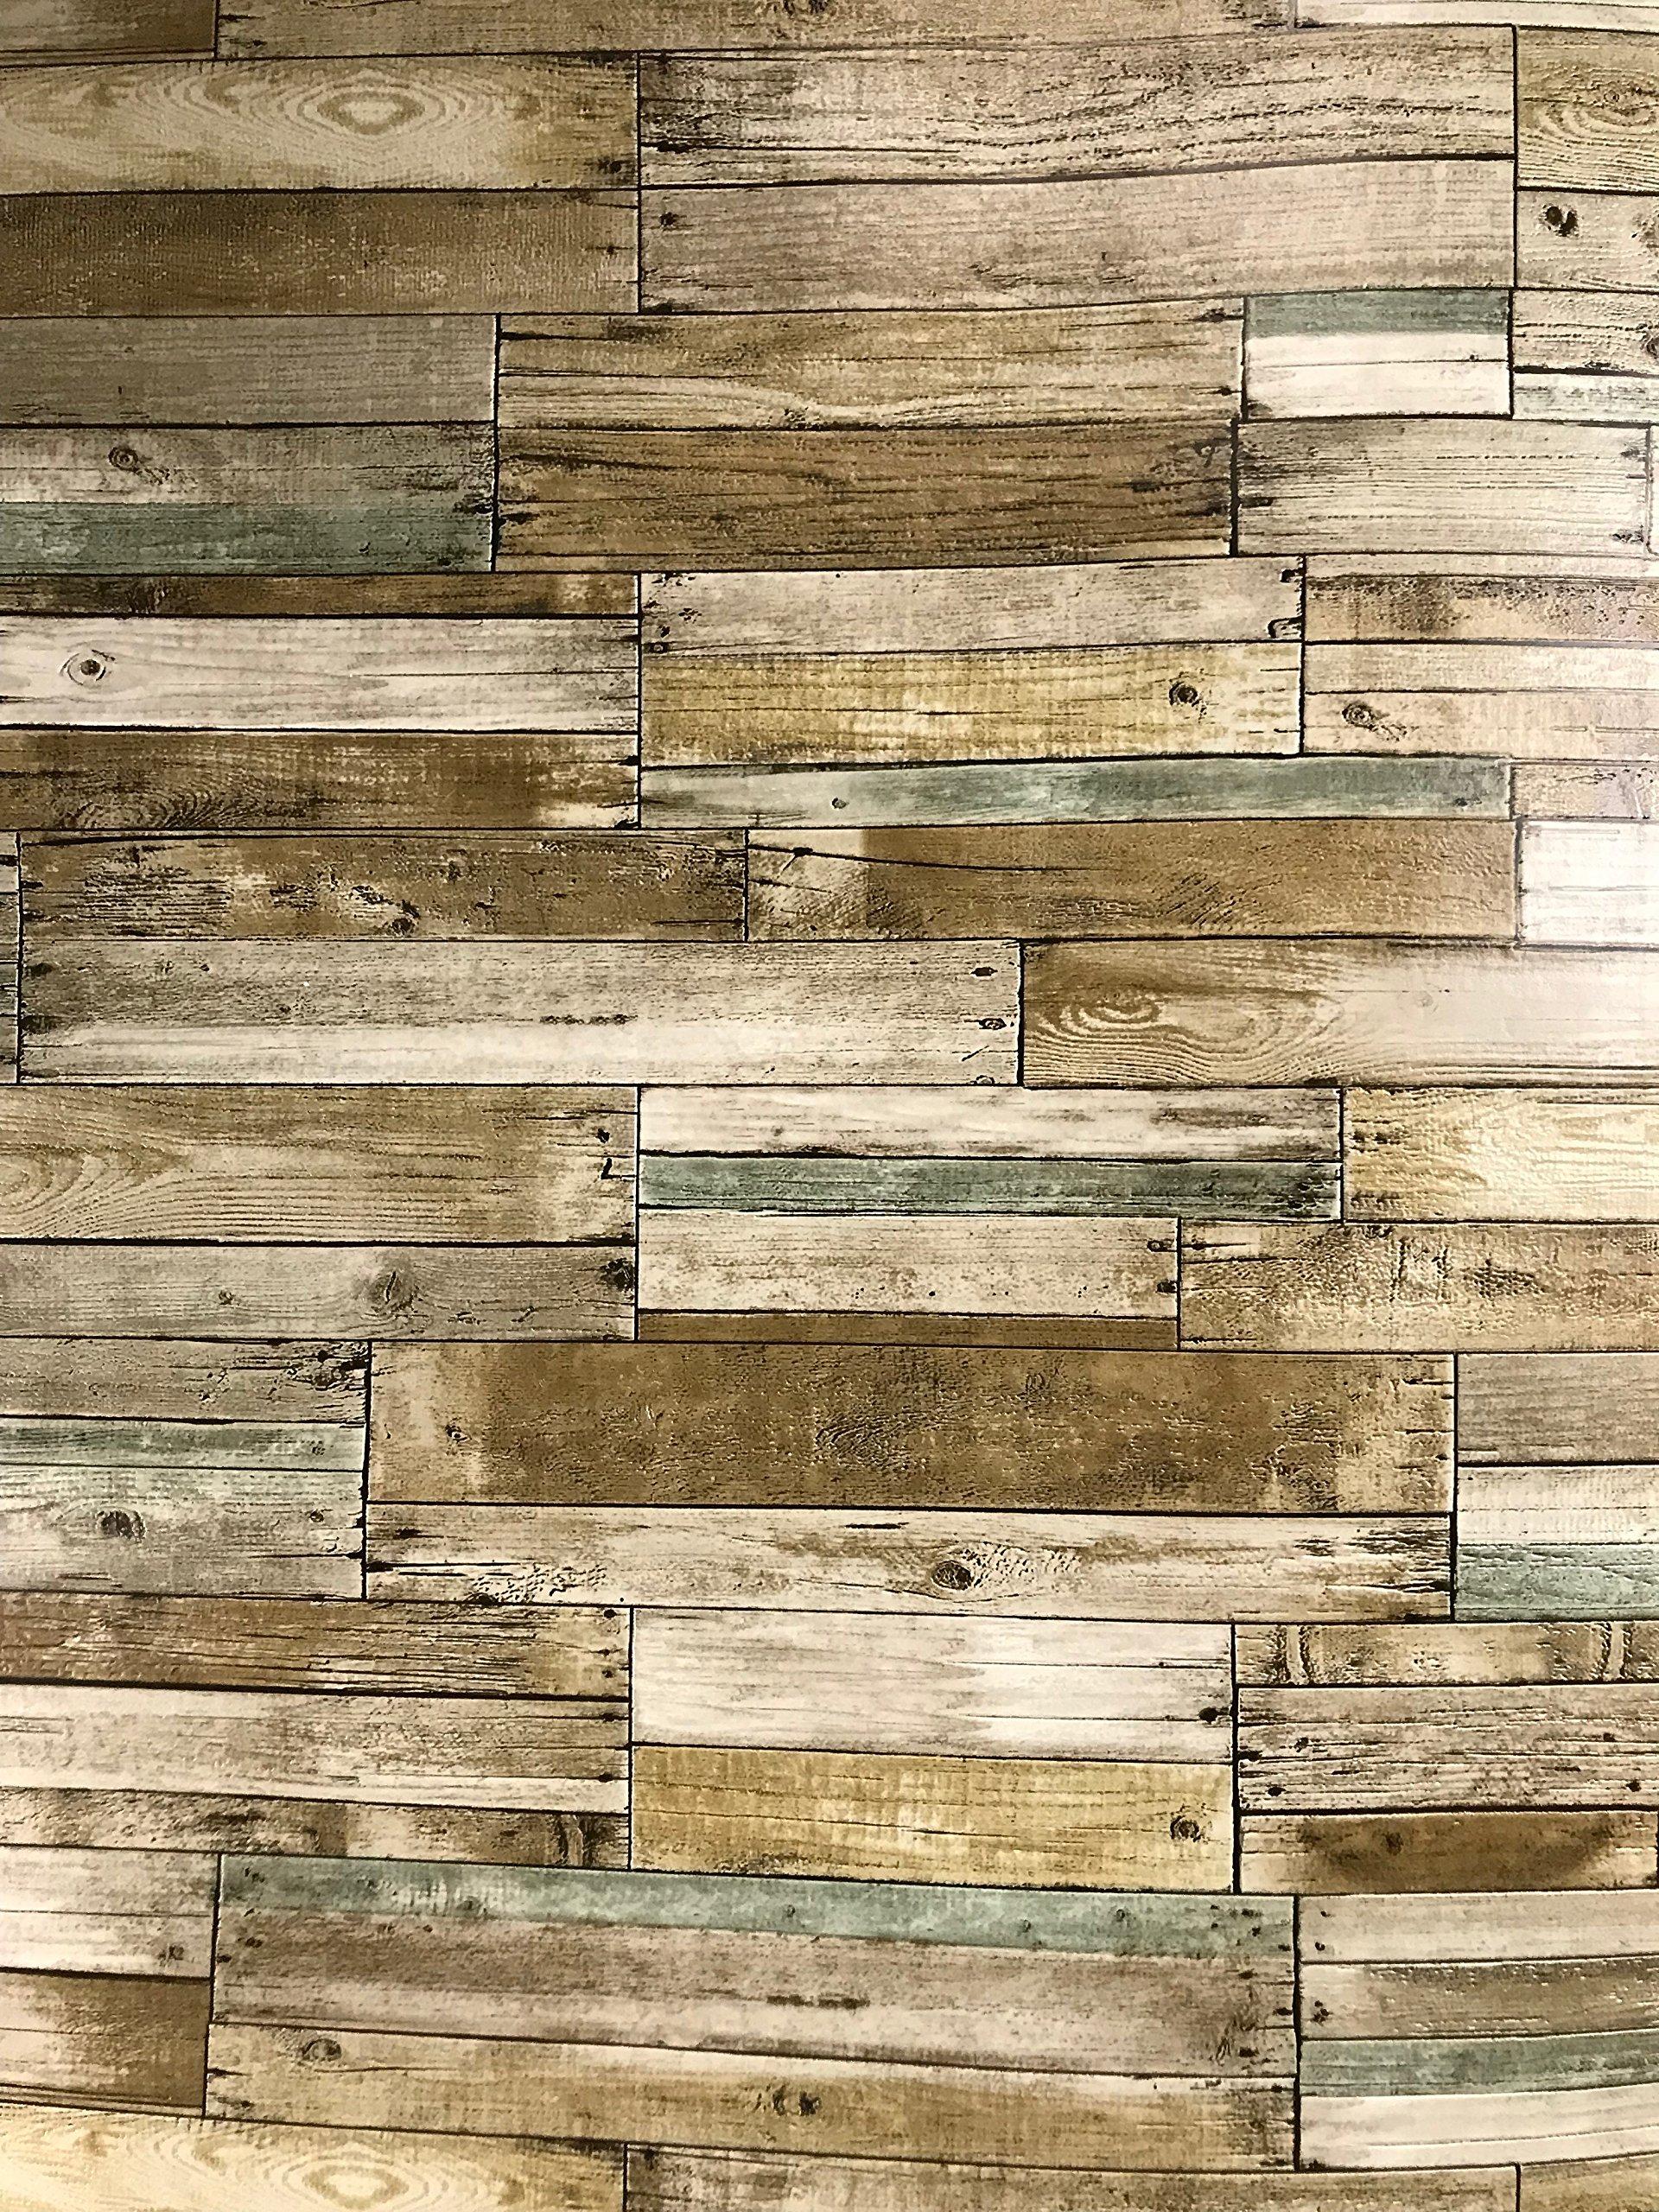 Slavyanski vinyl wallpaper brown grey with black seams old vintage retro faux rust rustic barn Distressed wood textured pattern double roll wallcoverings wall paper coverings textures washable modern